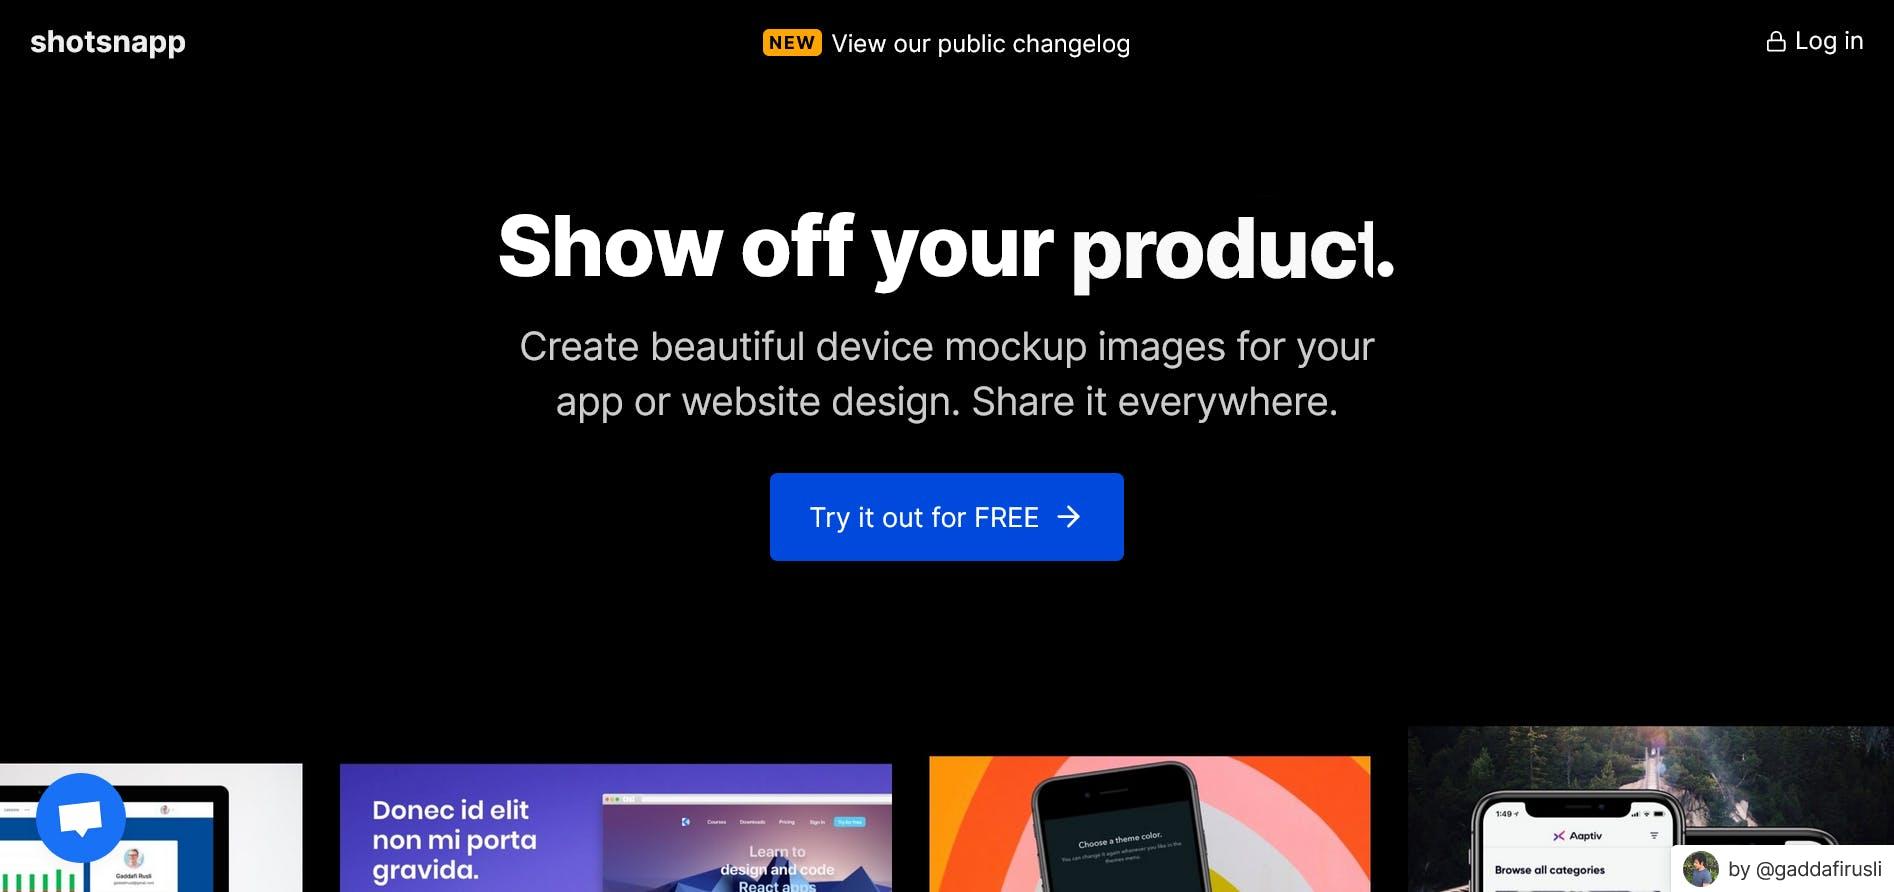 Screenshot 2021-04-29 at 21-12-55 shotsnapp - Create beautiful mockup presentation.png